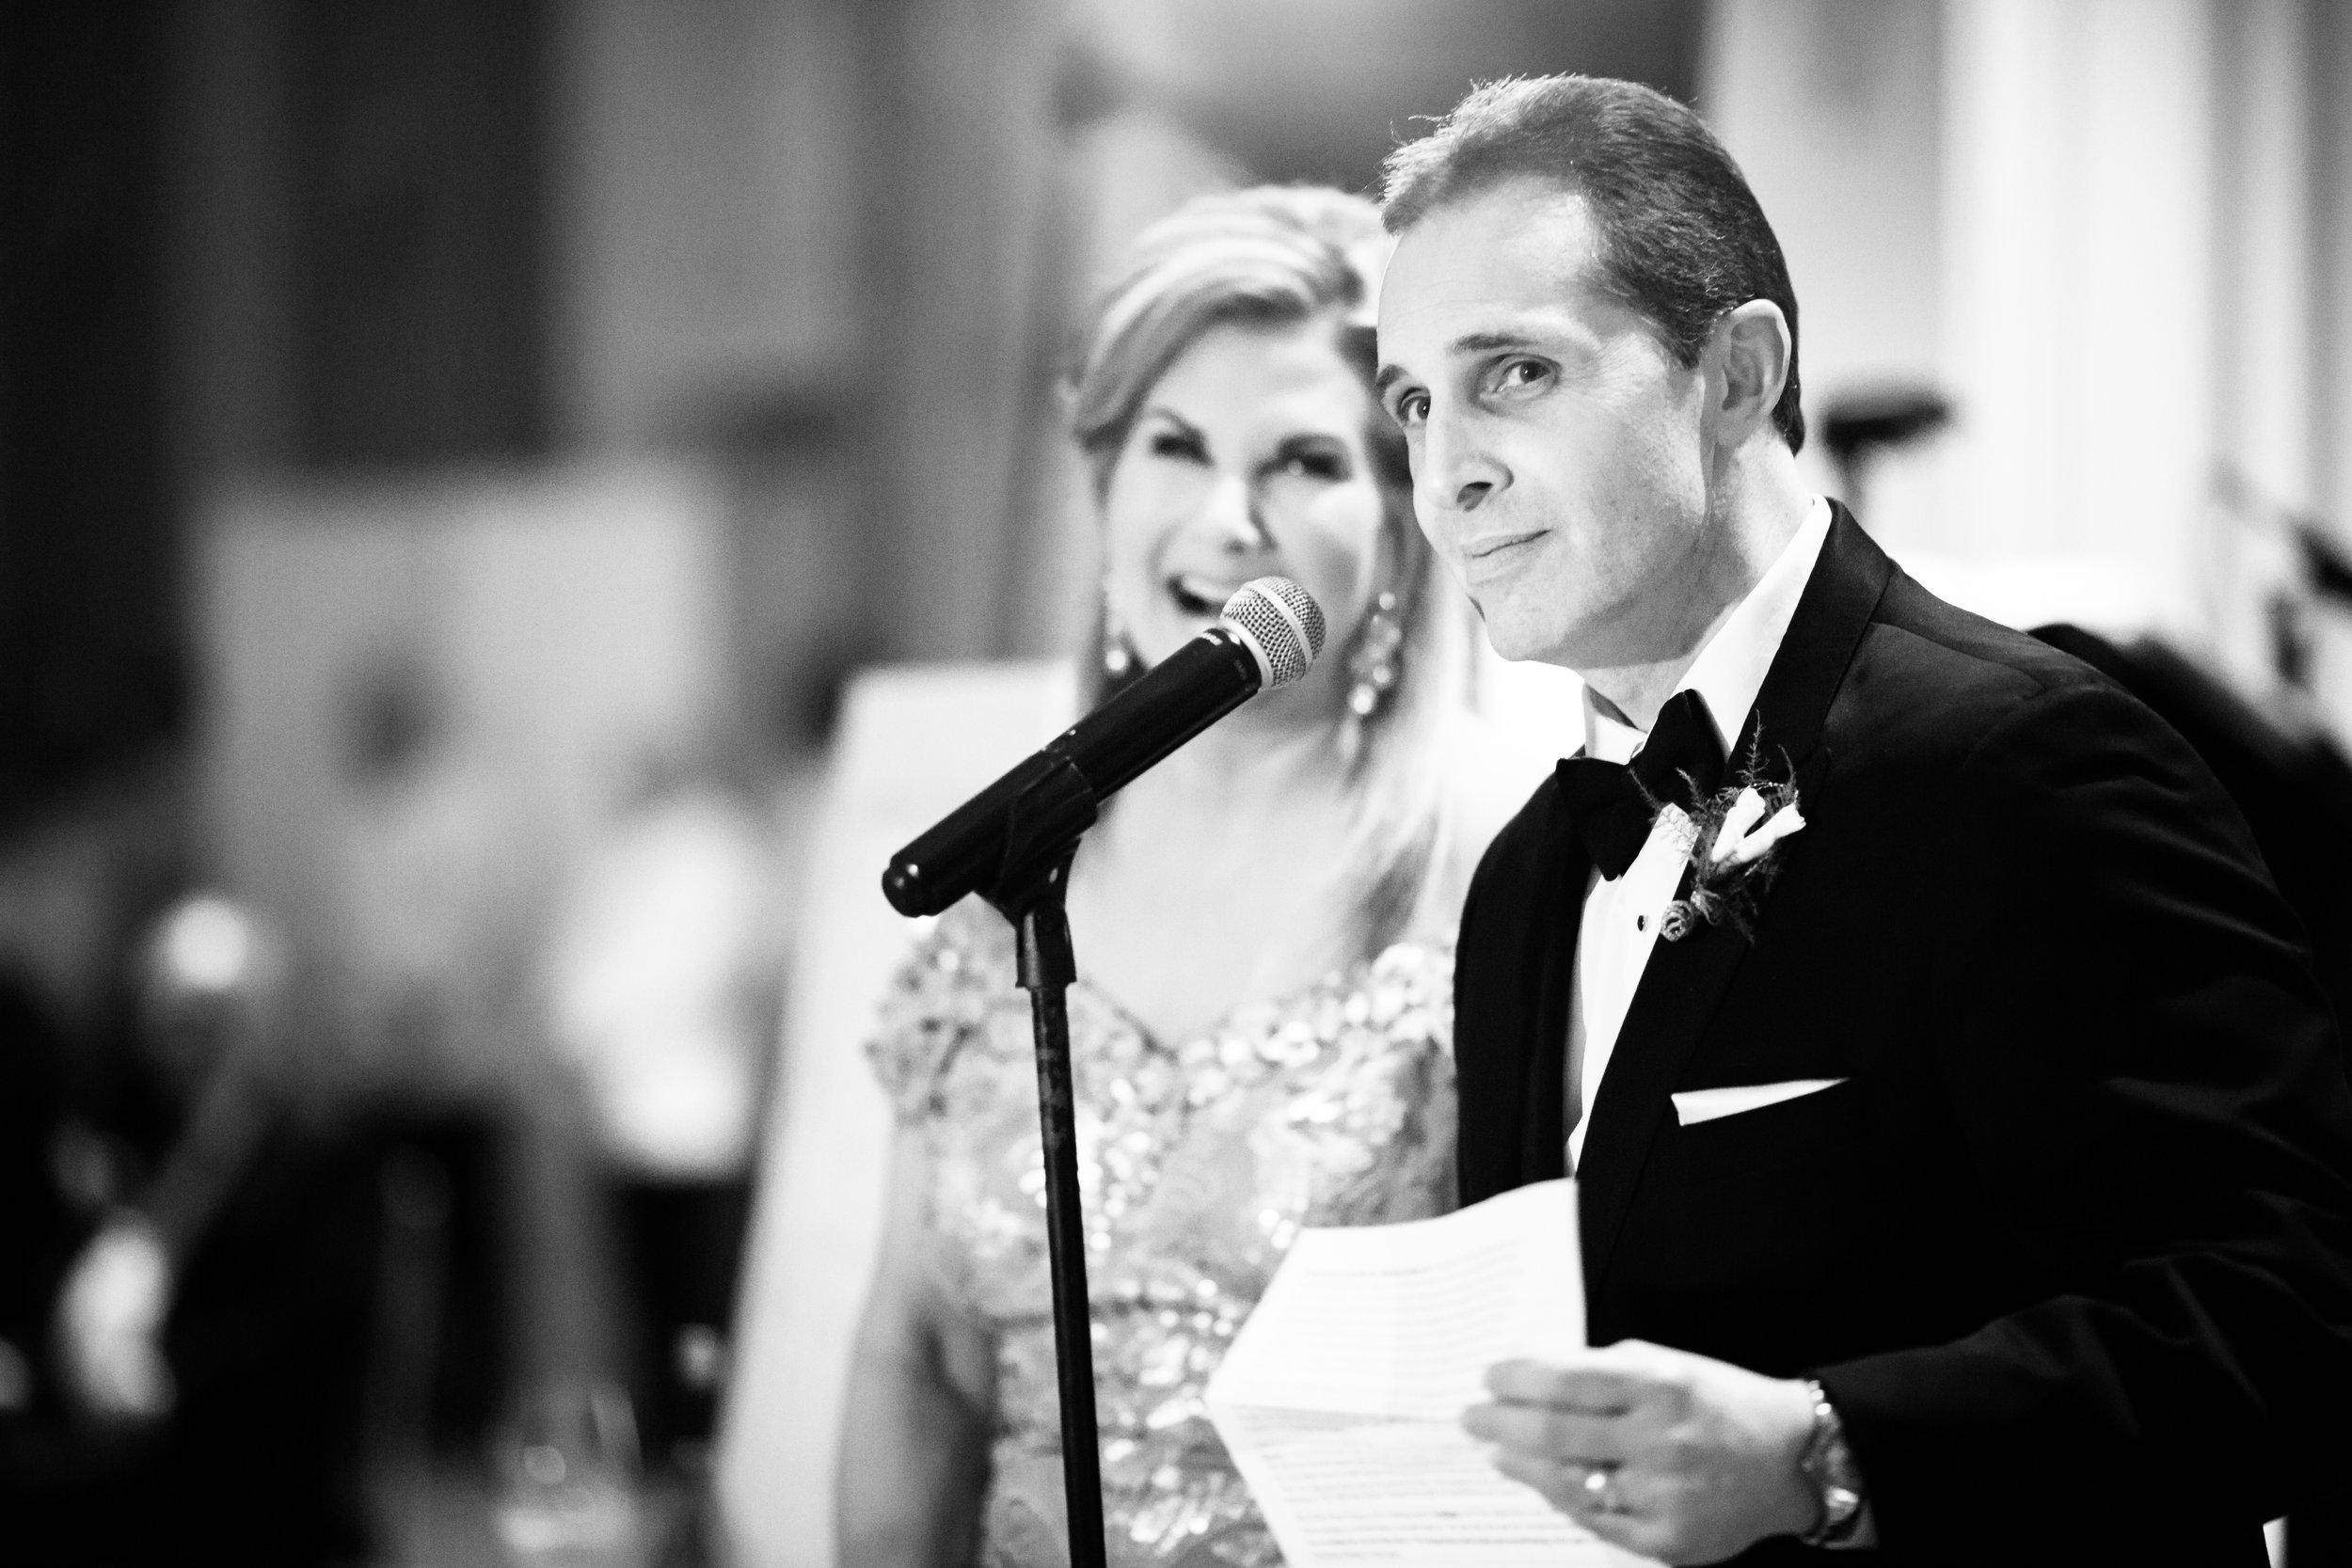 Elegant wedding at the JW Marriott Chicago29.jpg